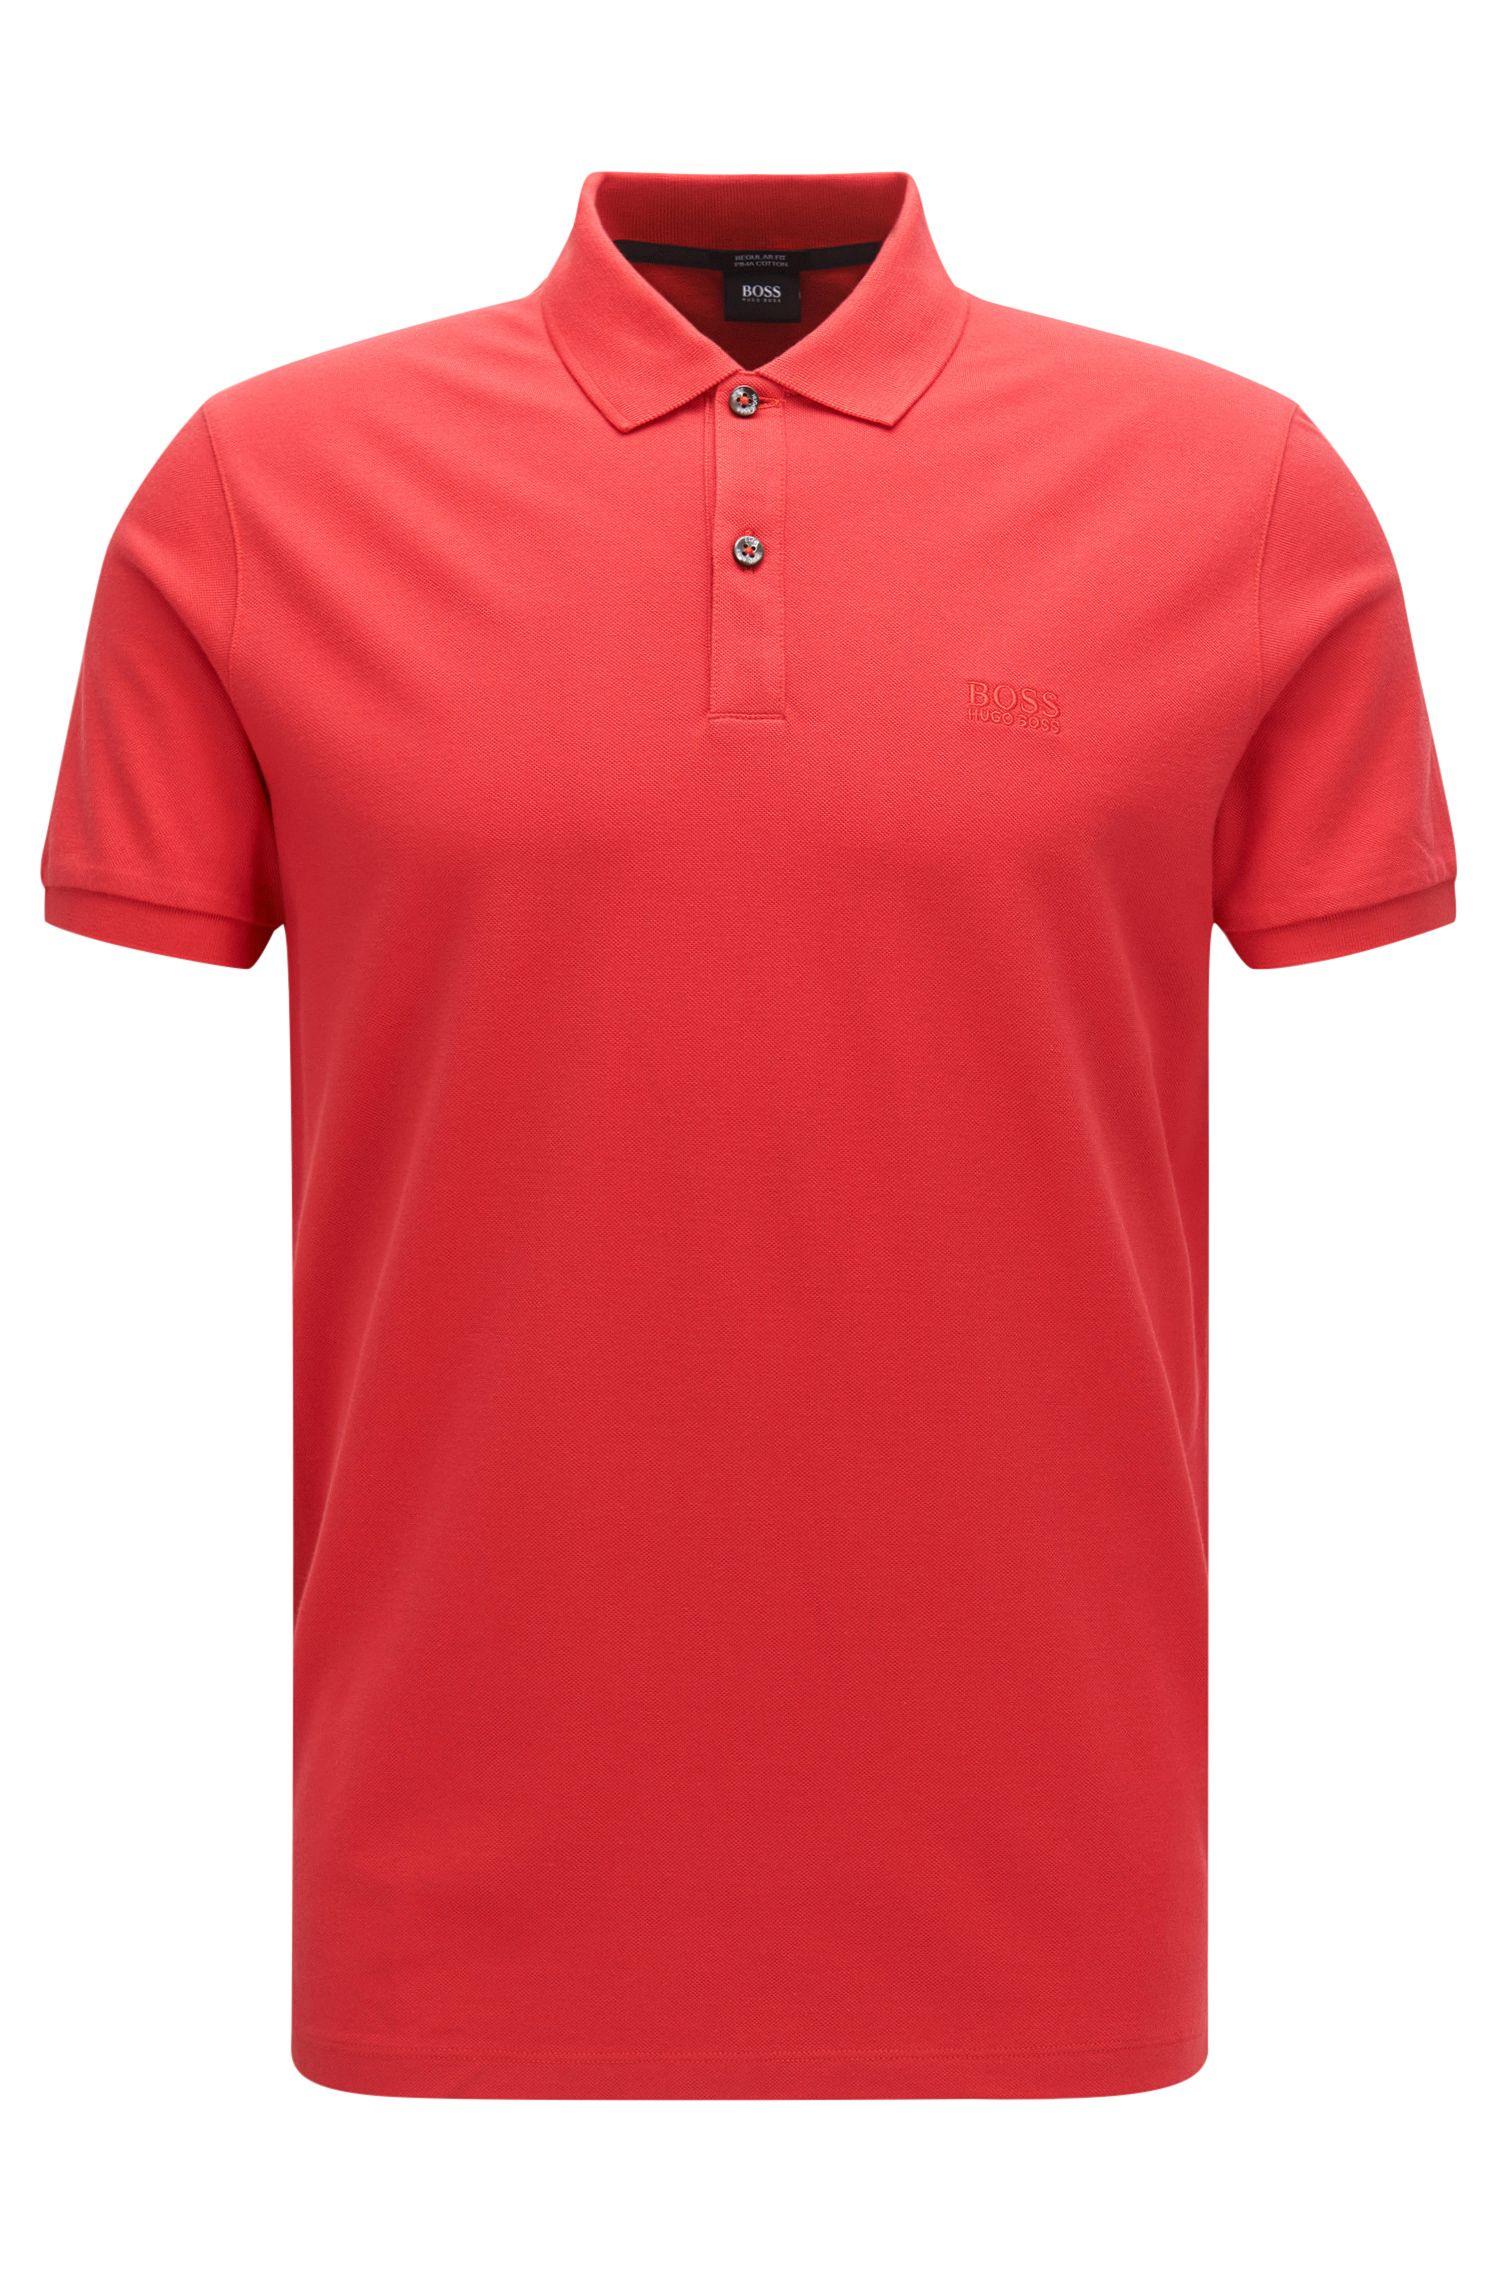 'Pallas' | Regular Fit, Cotton Polo